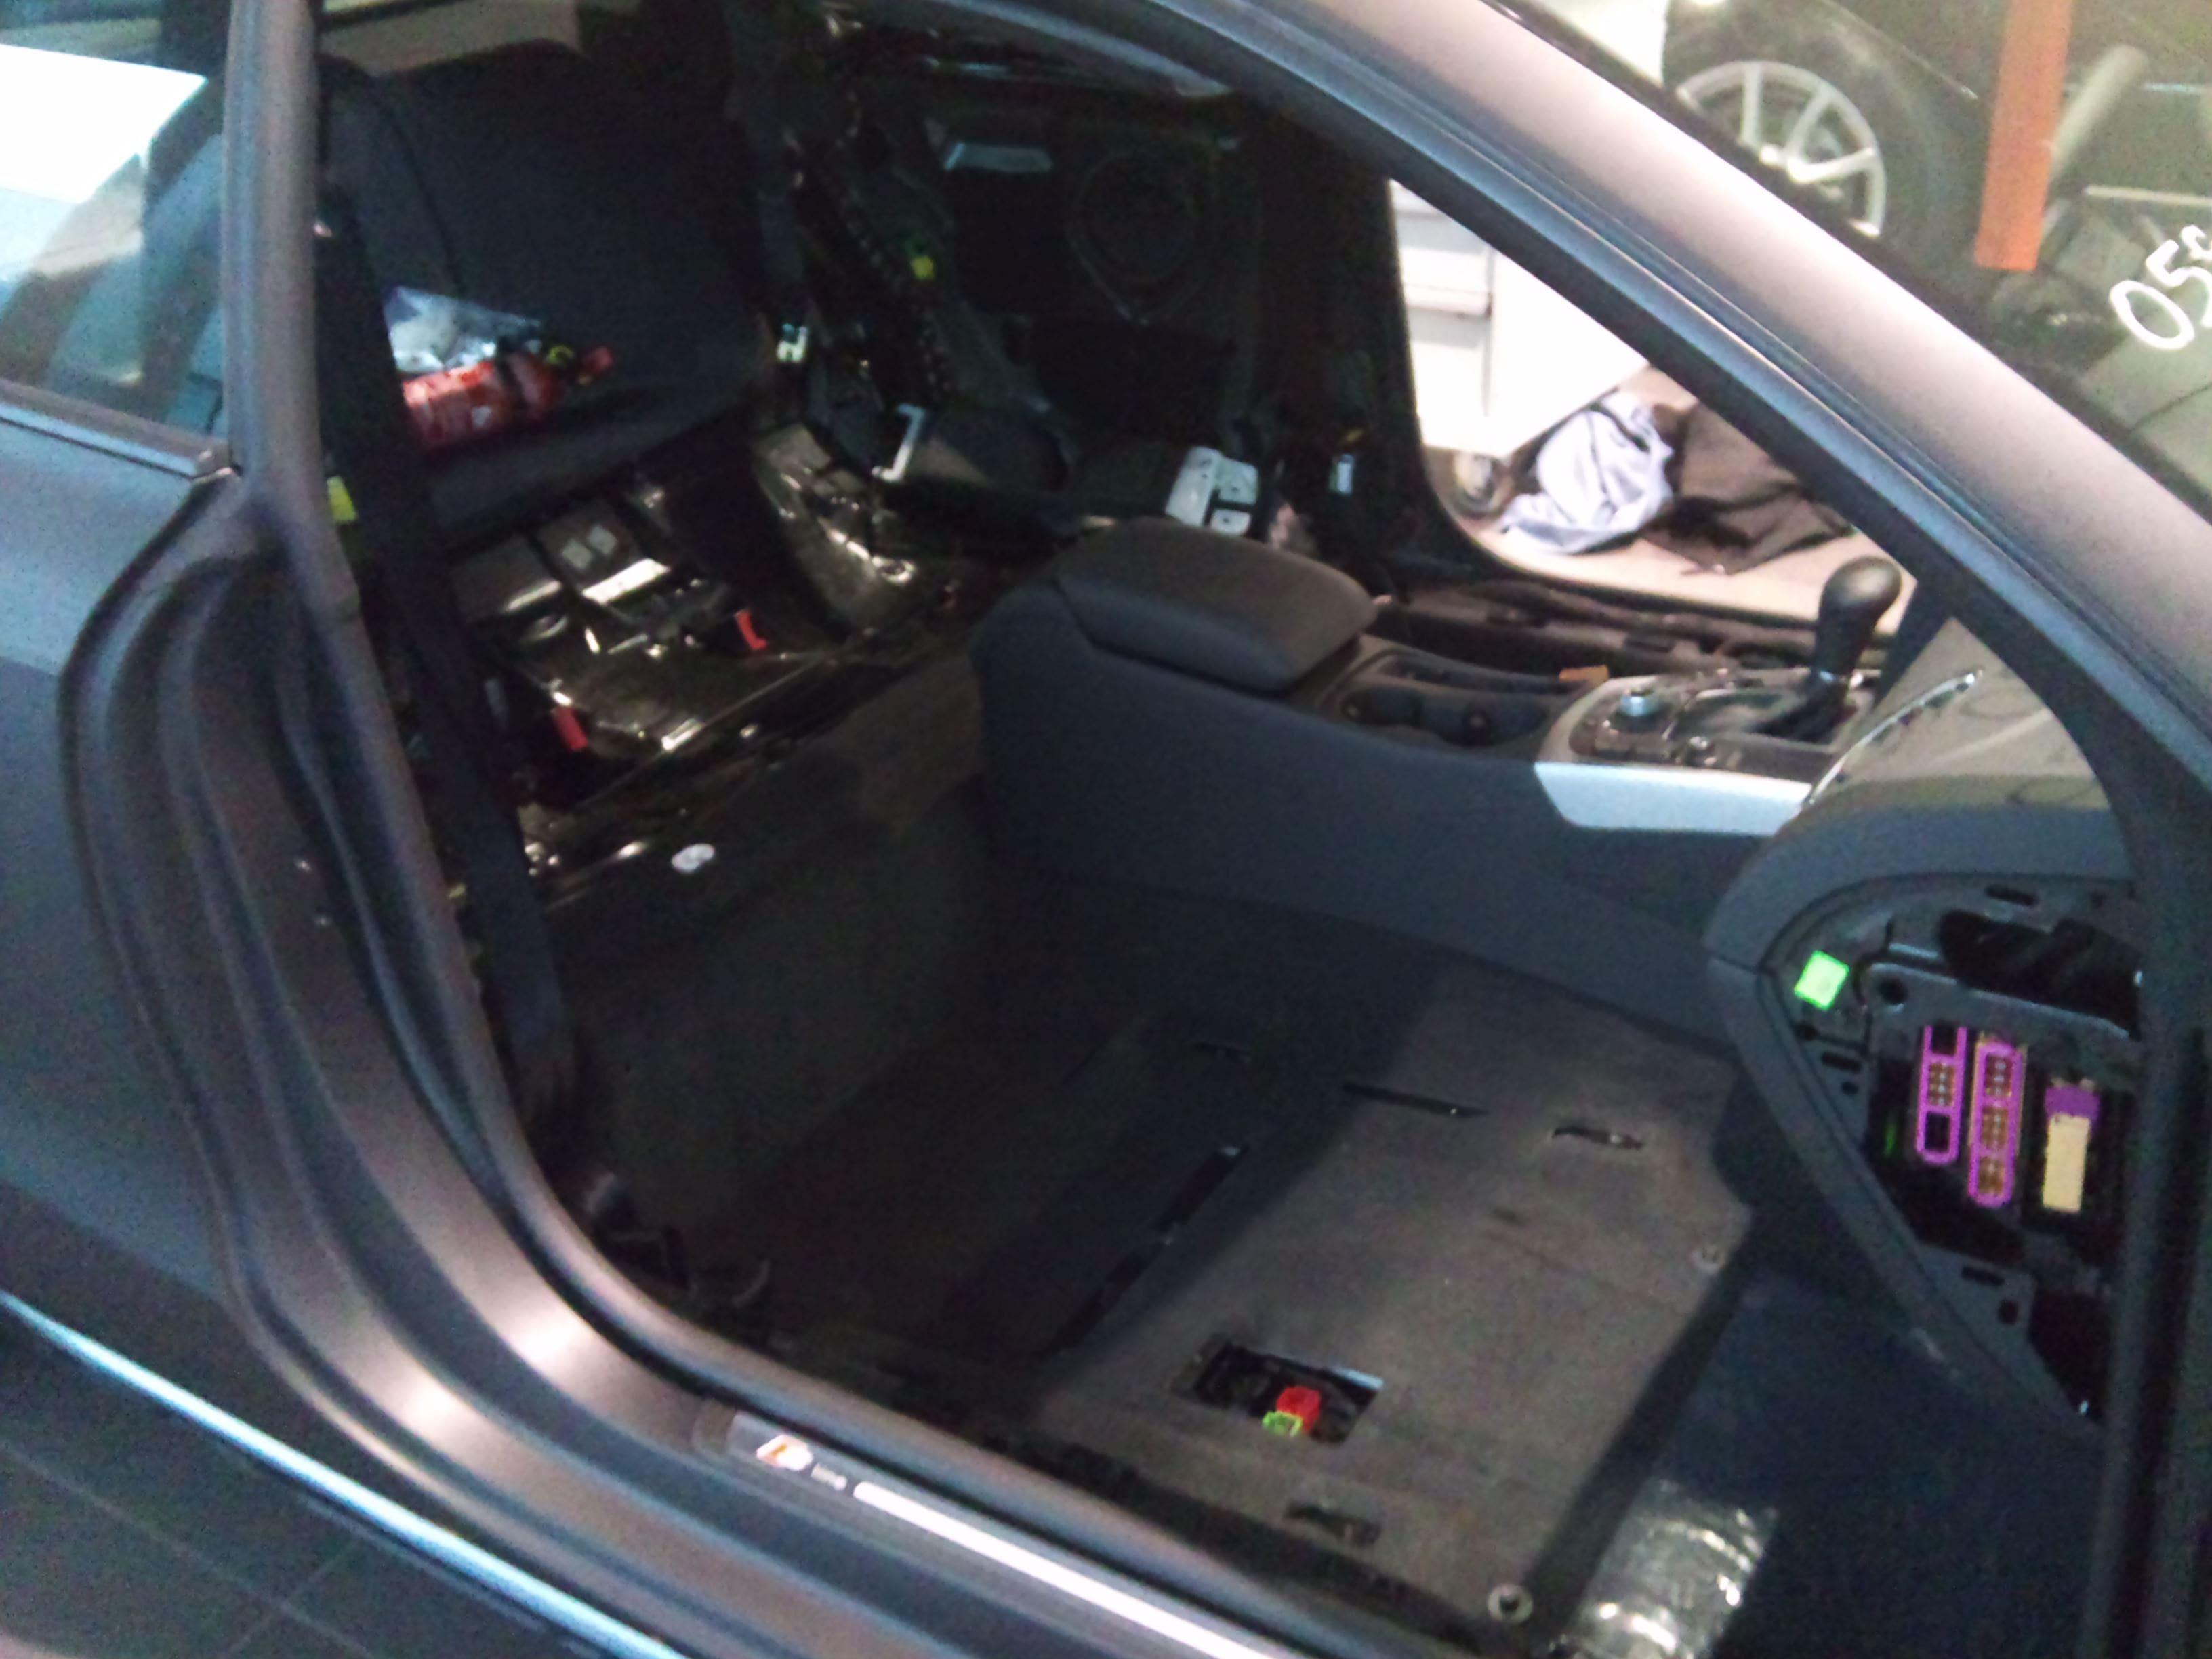 Audi A5 Coupe met Mat Zwarte Wrap, Carwrapping door Wrapmyride.nu Foto-nr:4552, ©2021